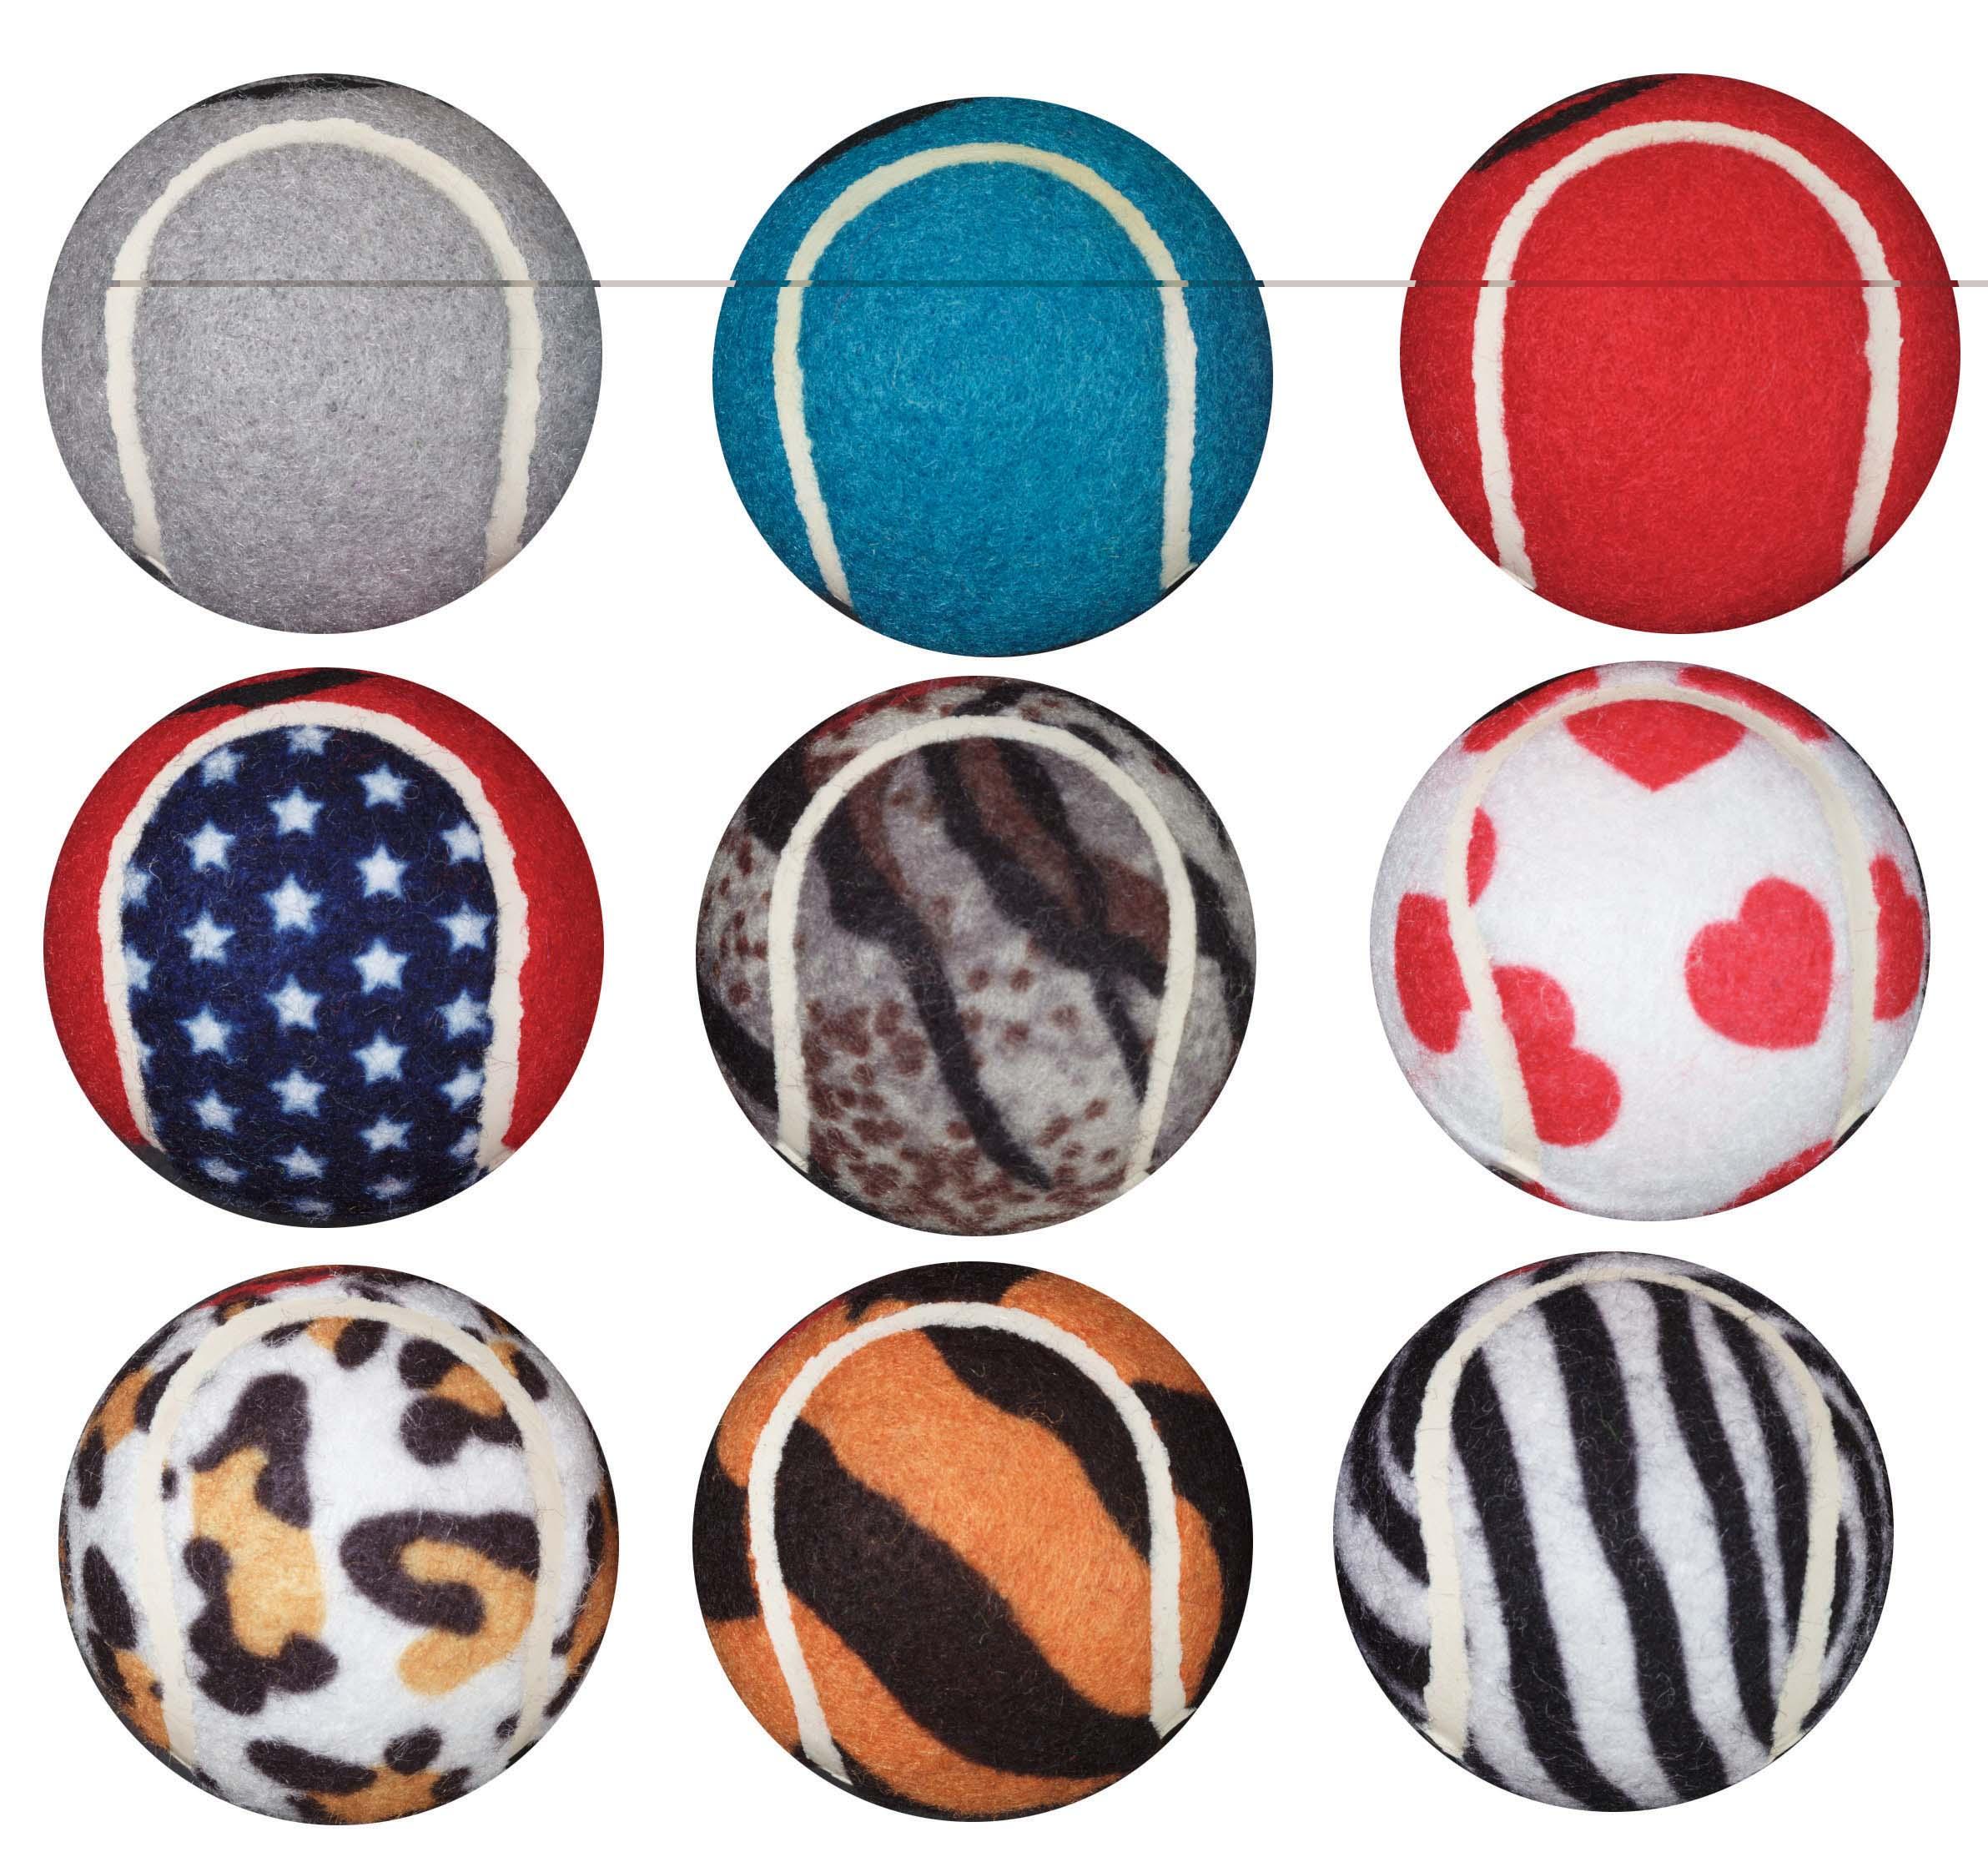 walkerballs-white-w-hearts-1-pair-510-1035-9918-lr-3.jpg